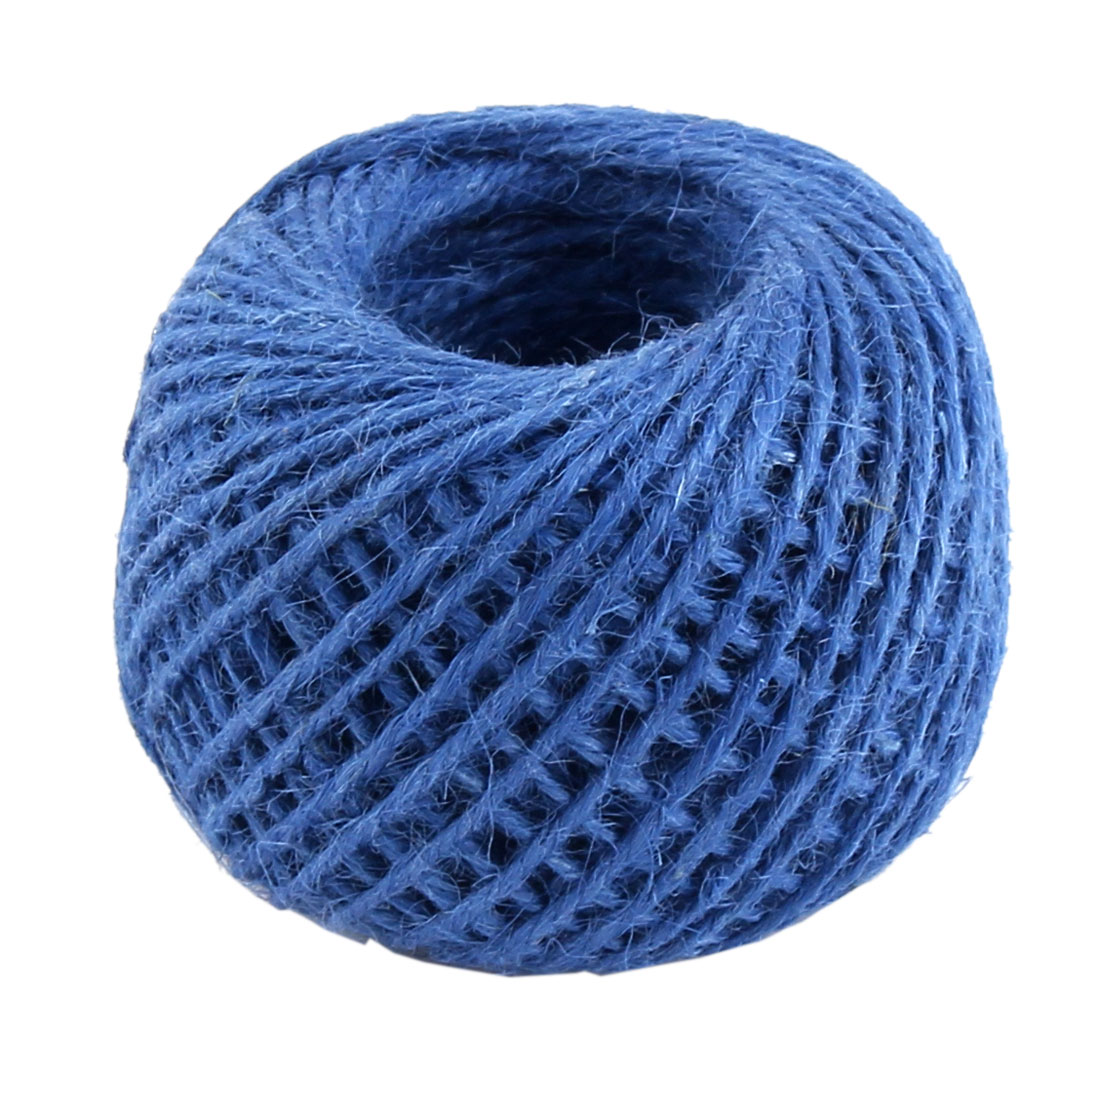 Jute Burlap Ribbon Twine Rope Cord String Wrap Roll Blue 2mm Dia 50m Length